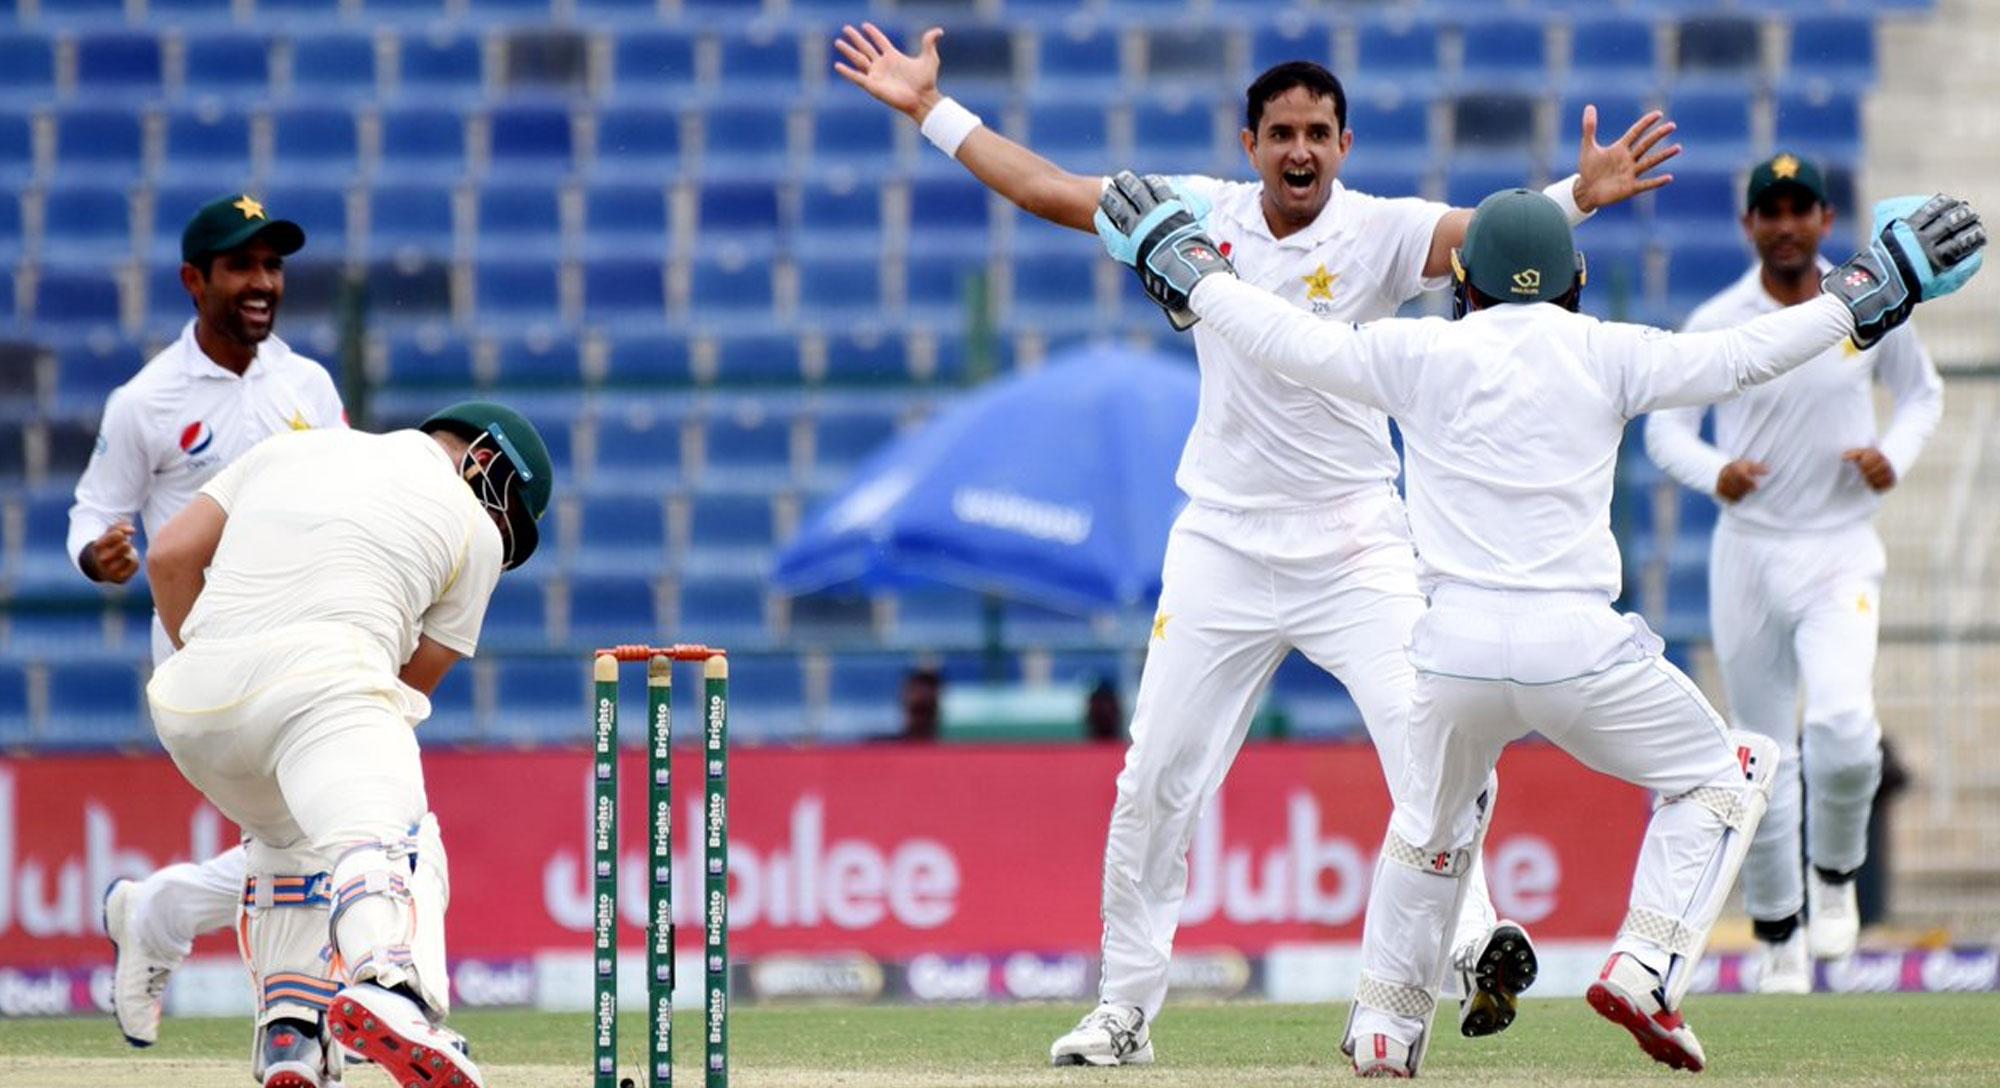 abbas sarfraz star as pakistan clinch series against australia